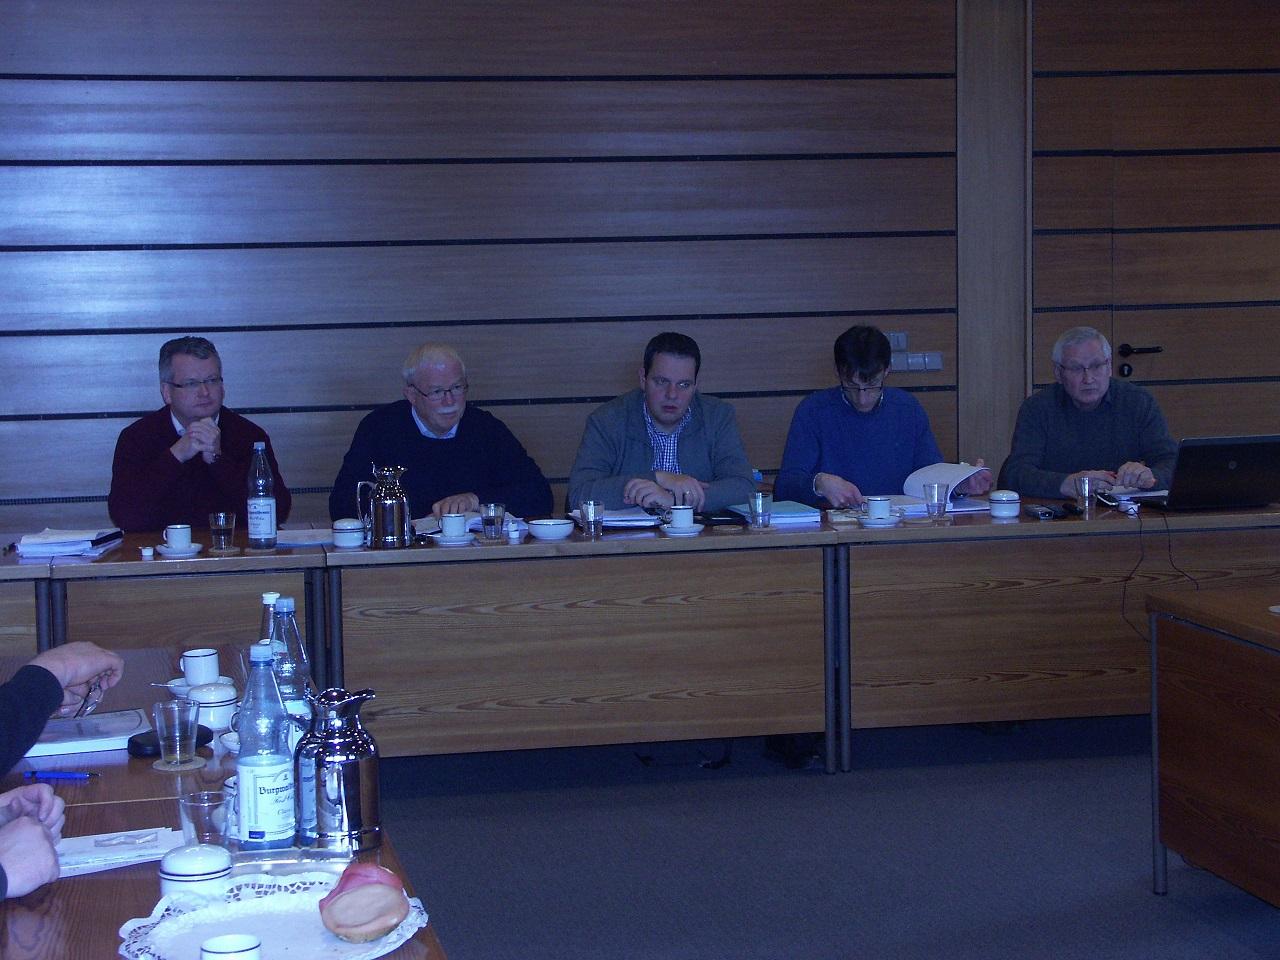 v.l.: 1. Beigeordneten Martin Tesing; CDU-Fraktionsvors. Karl-Heinz Tünte; Bürgermeister Andreas Grotendorst, Bilanzbuchhalter Thomas Greving sowie Kämmerer Hans-Jürgen Gerten